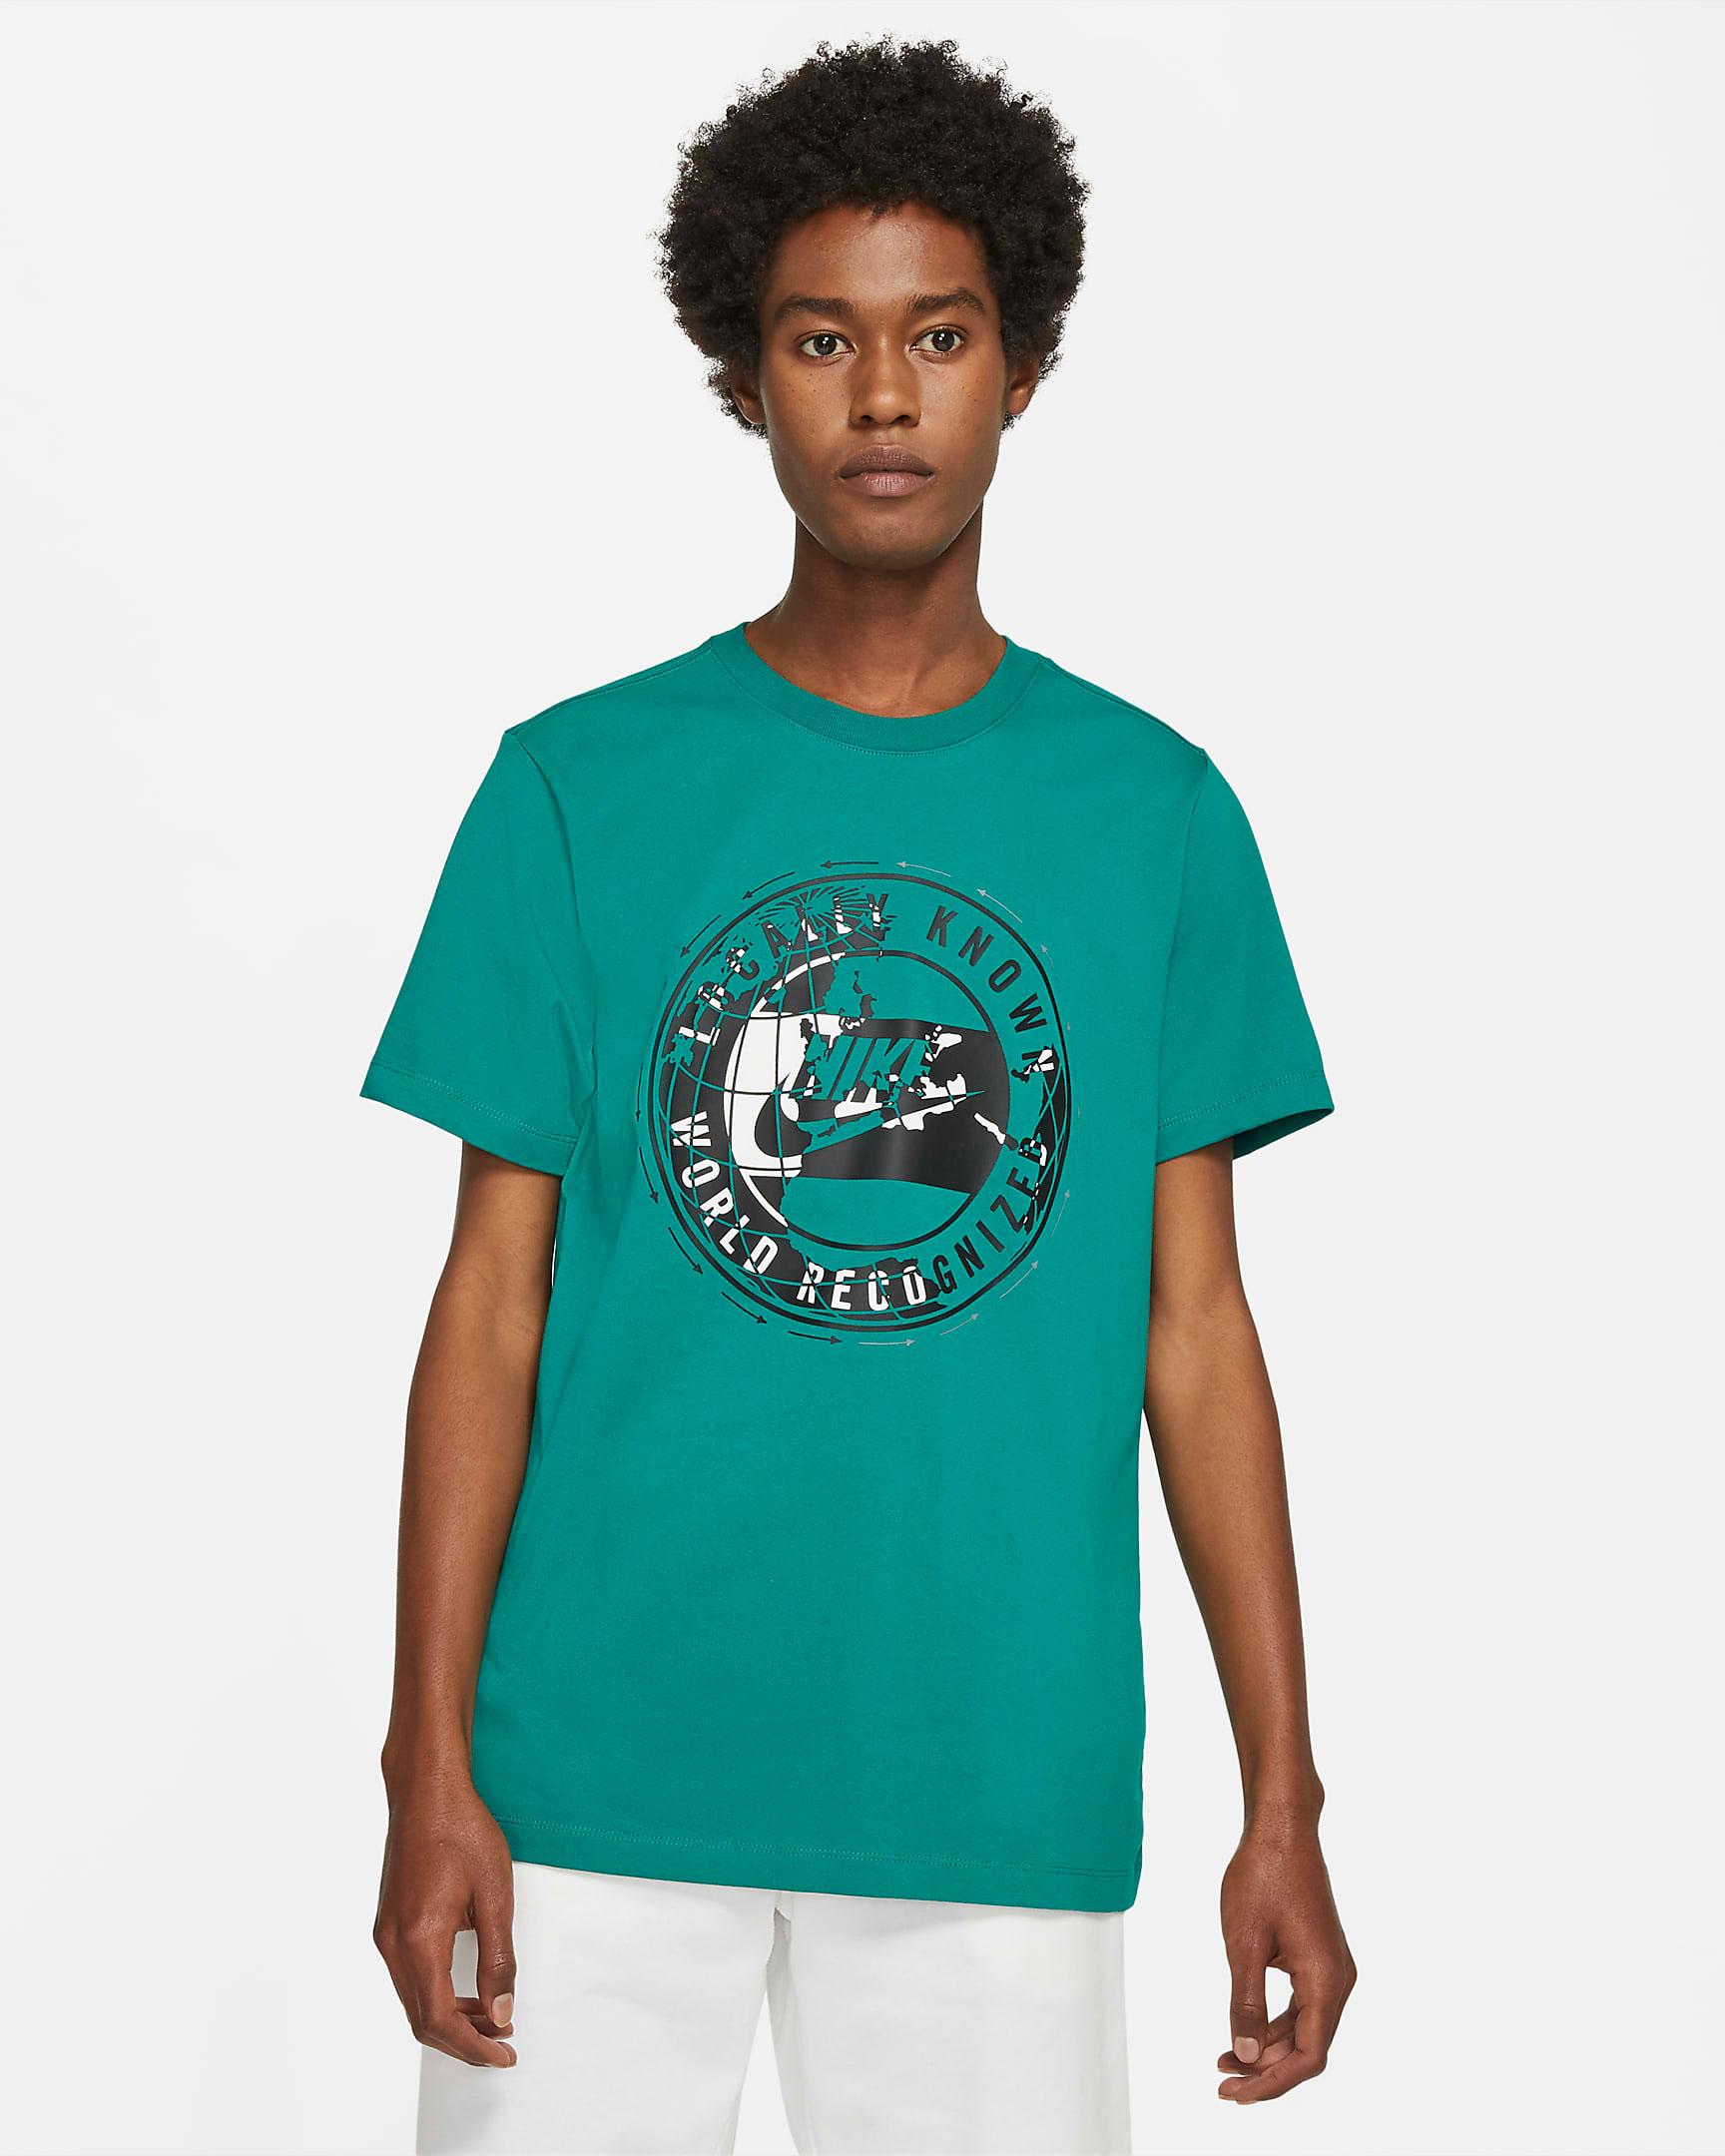 nike-air-griffey-max-1-freshwater-tee-shirt-match